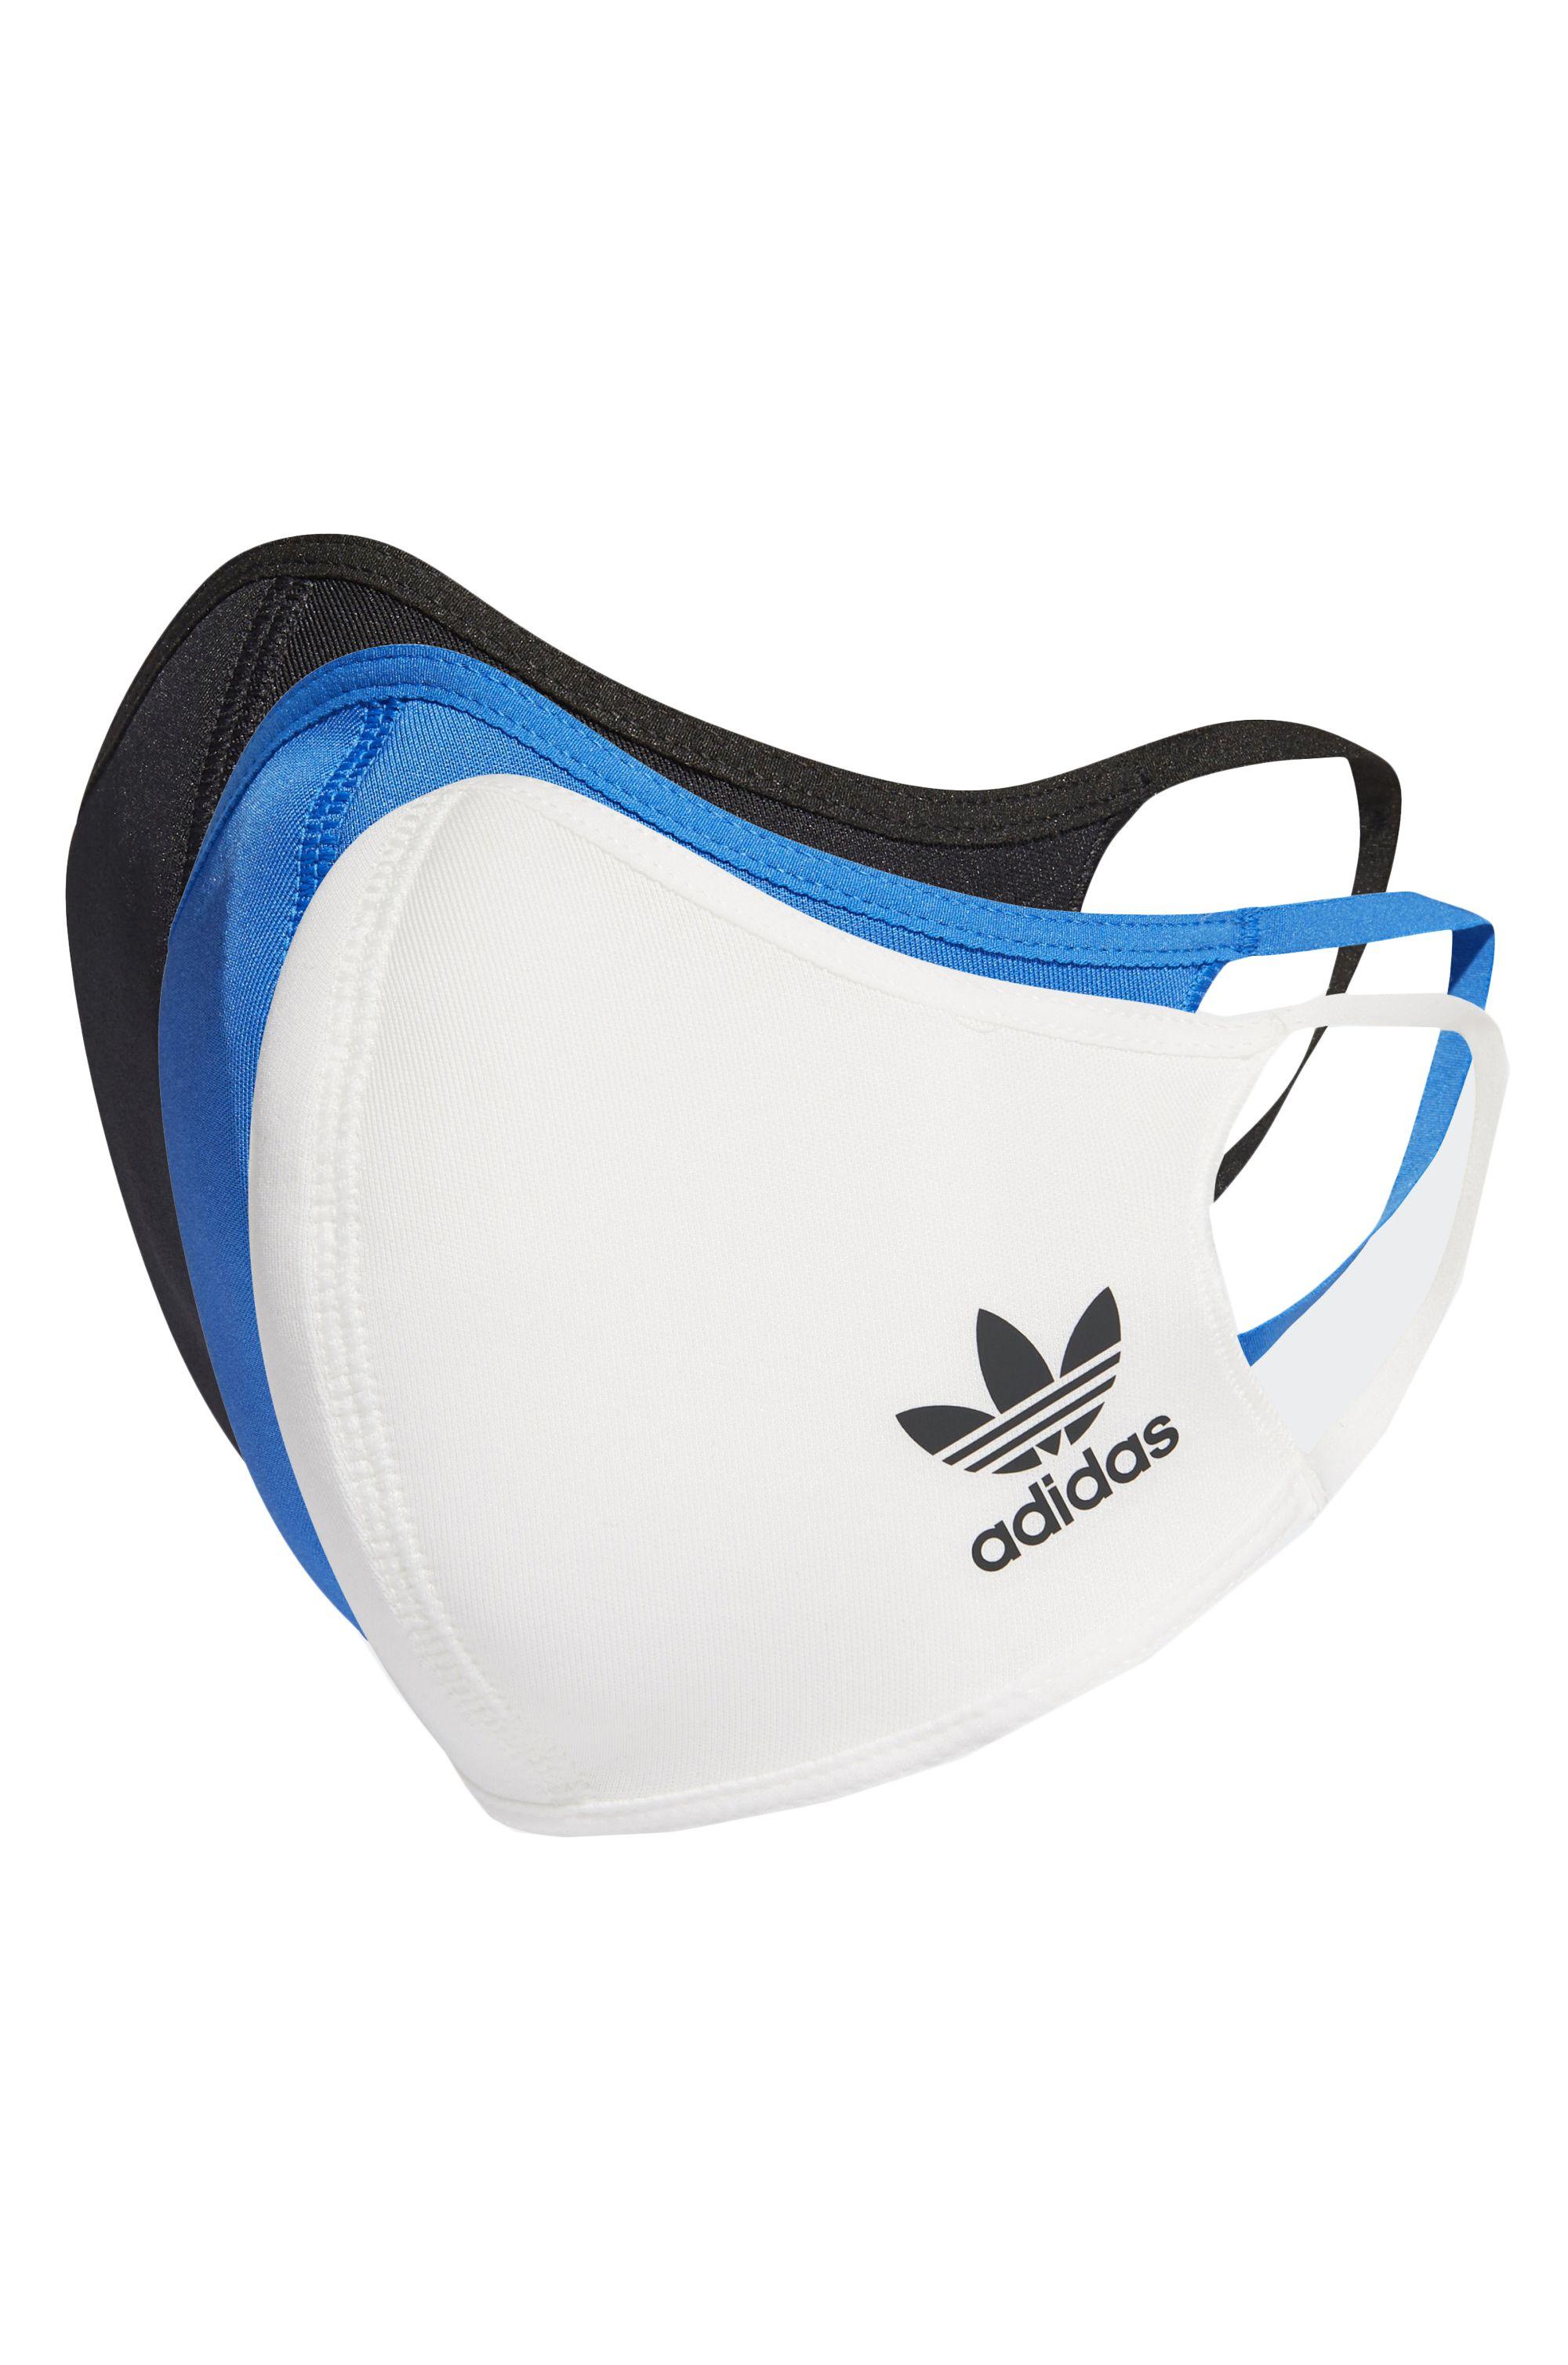 DV Adidas Máscara BOS LARGE MULTI 3PK Black/Blue/White